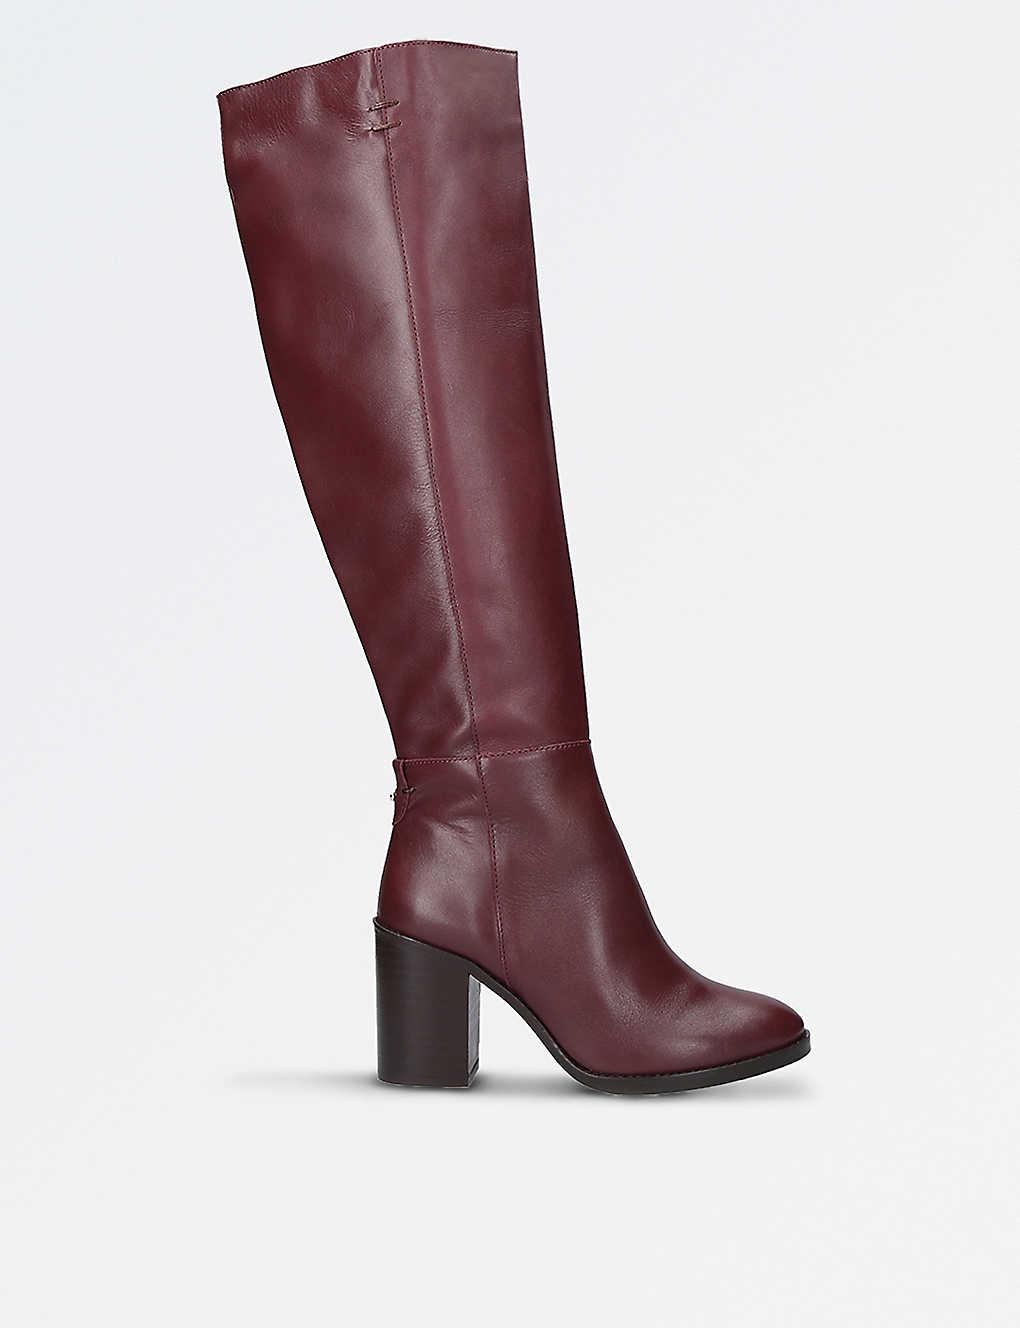 4b2fd6606f1 KURT GEIGER LONDON - Dora leather knee-high boots